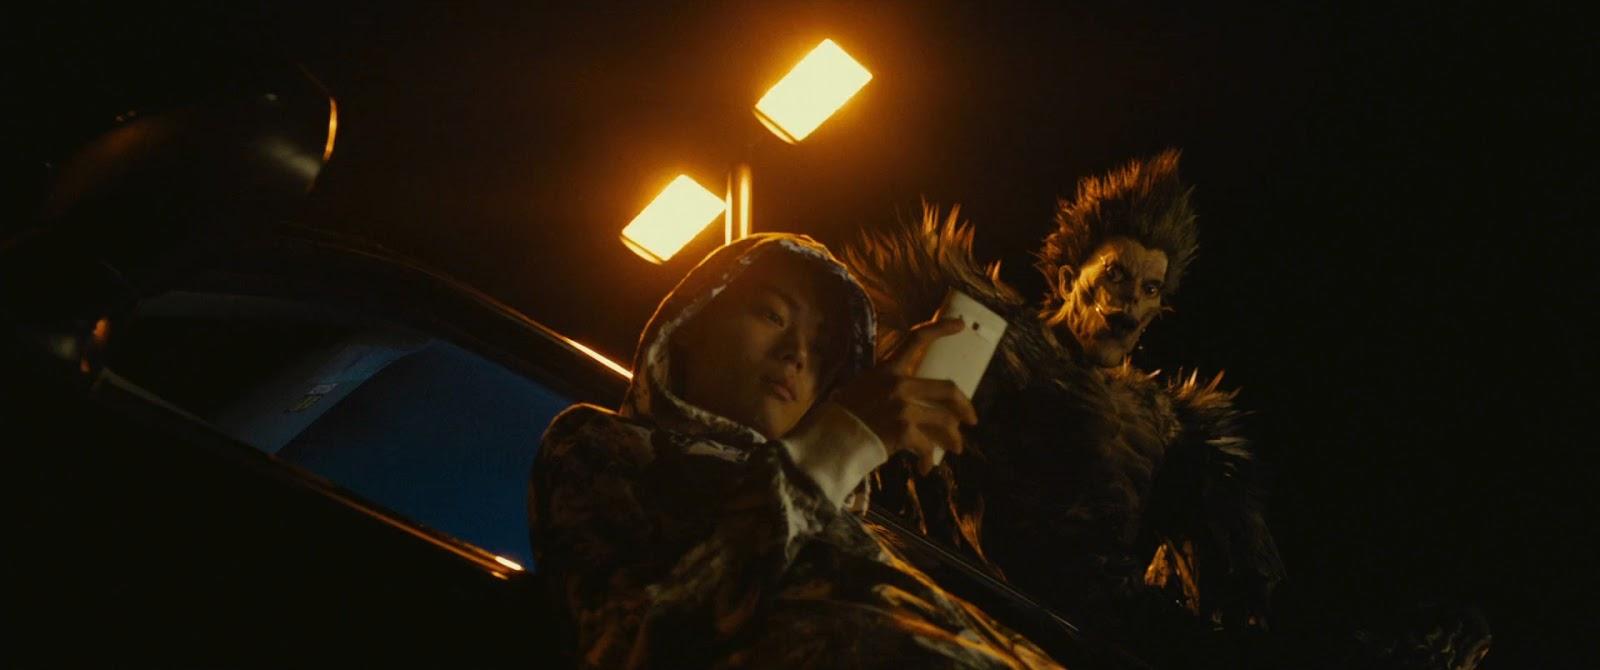 Death Note Light Up the New World (2016) HD 1080p Japones Sub Español captura 4